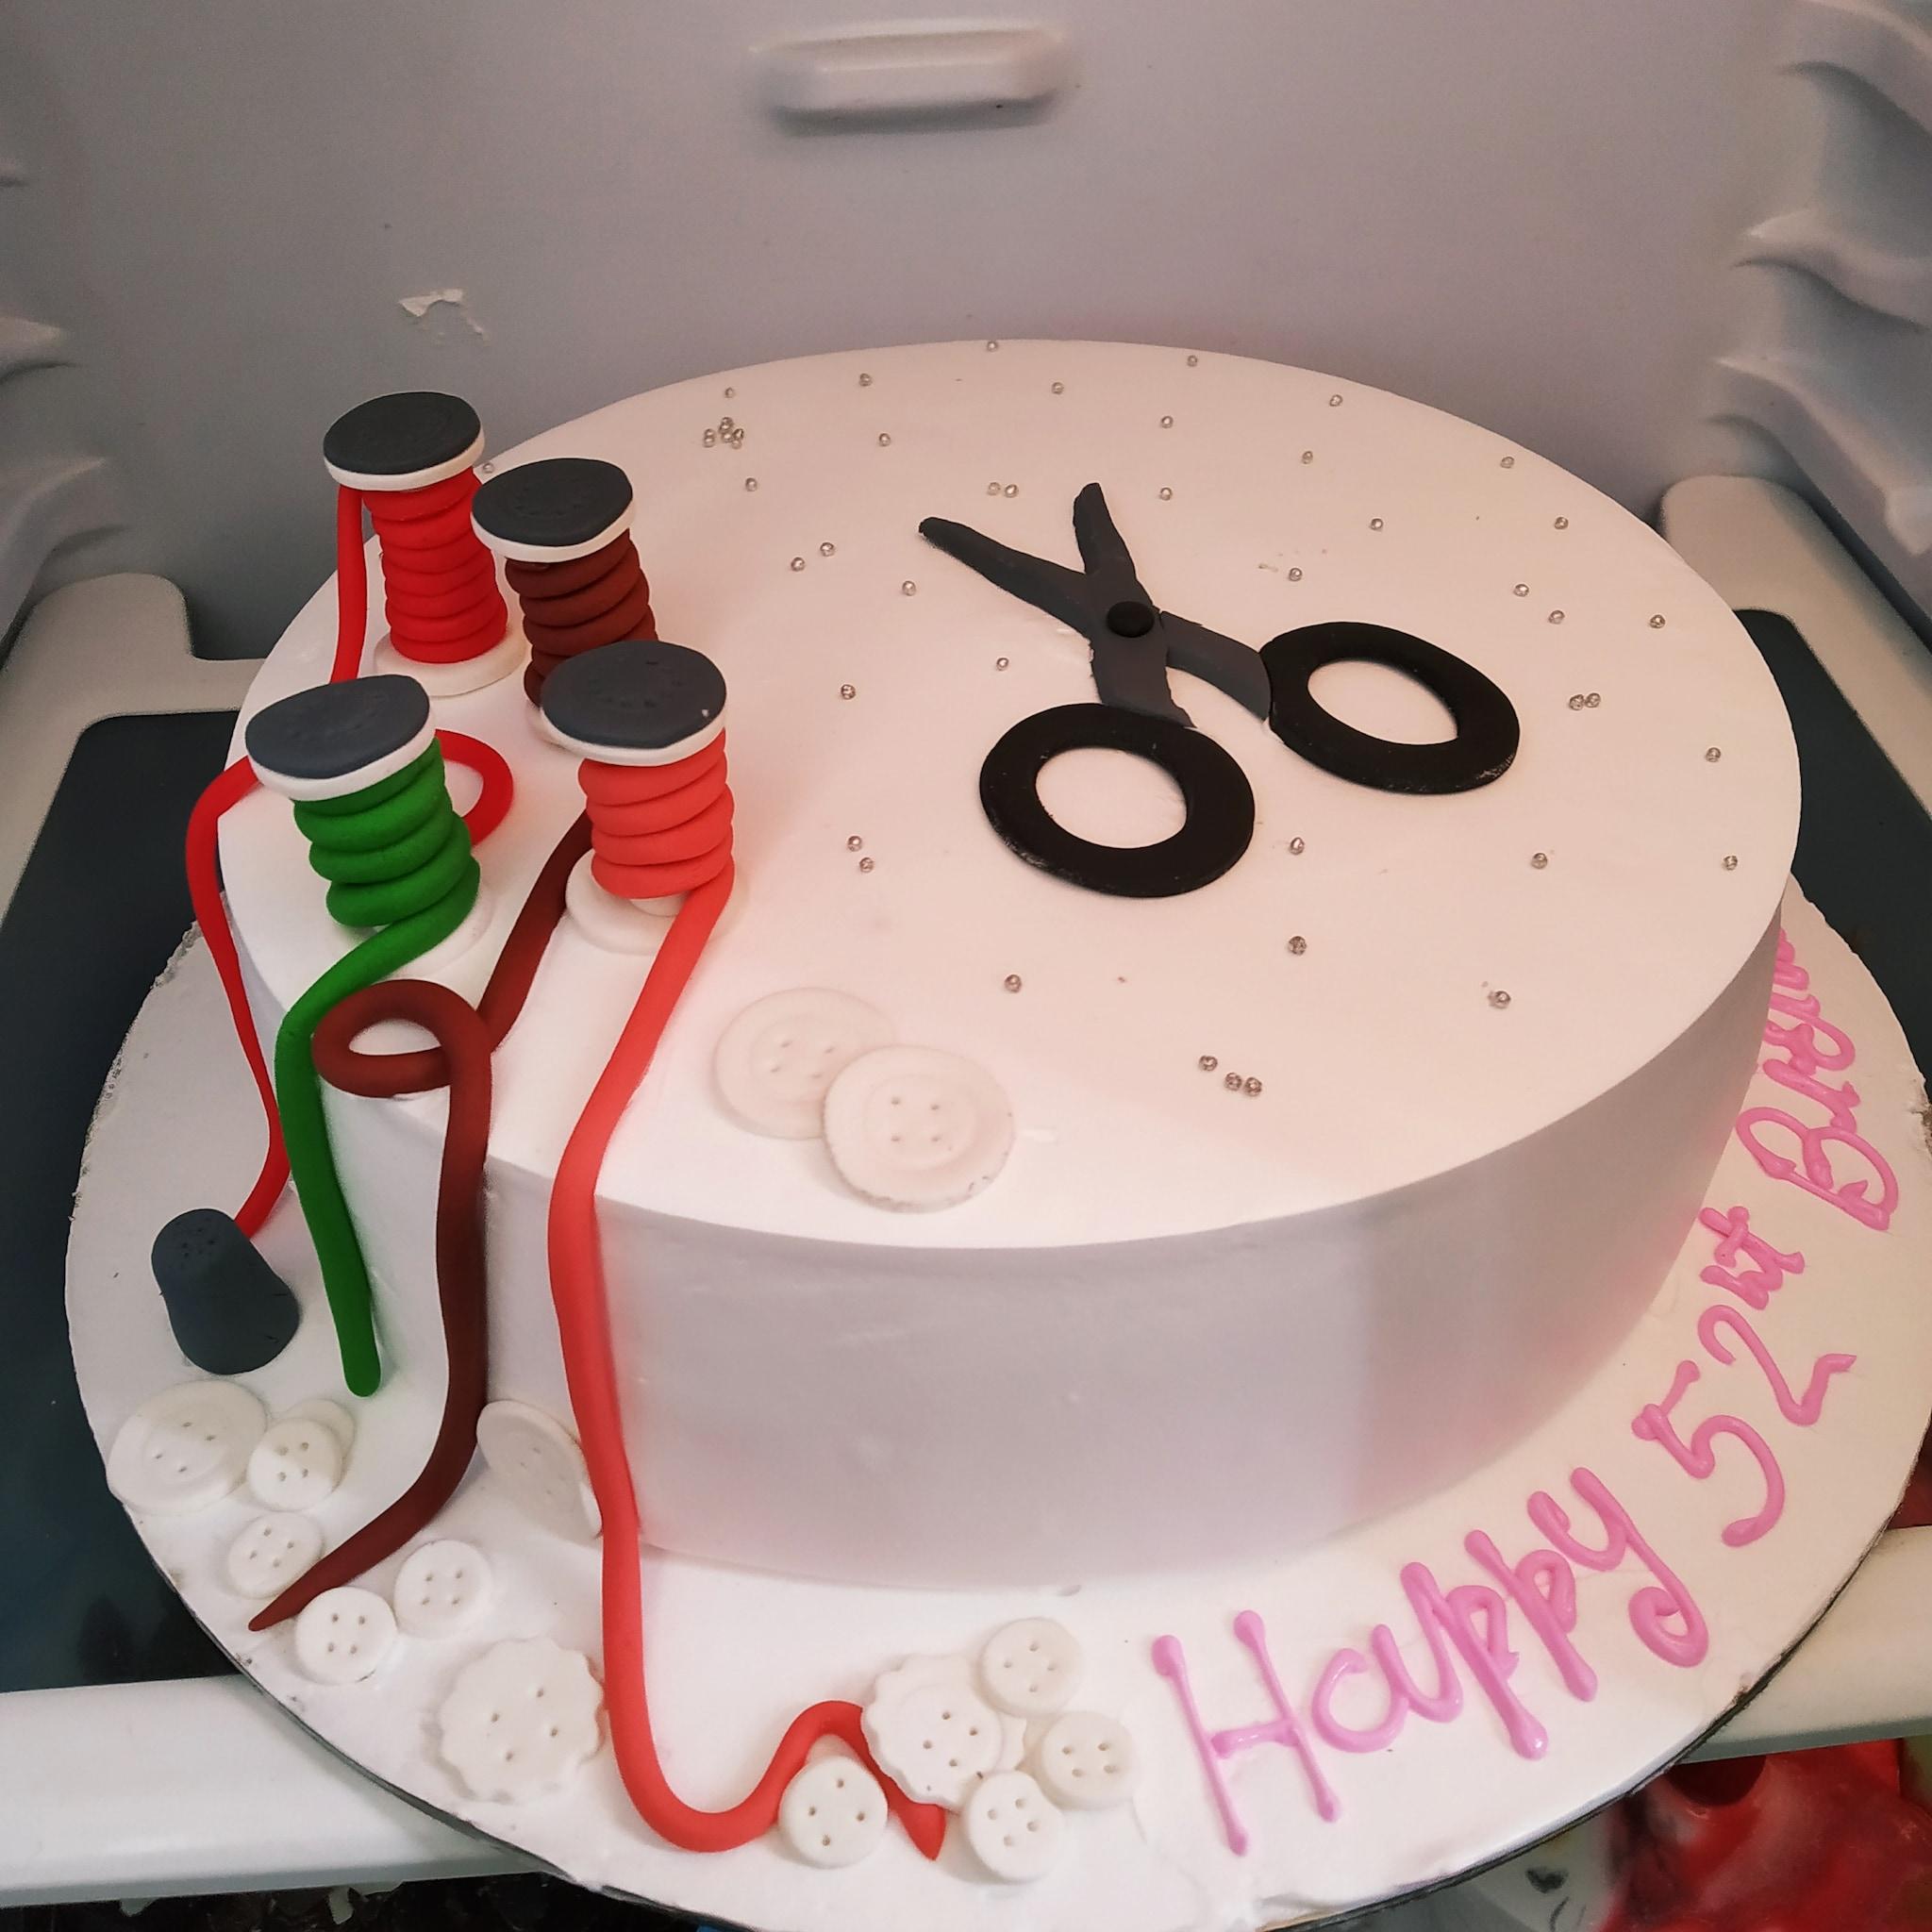 Fashion Designing Cake (1 Kg,Chocolate)